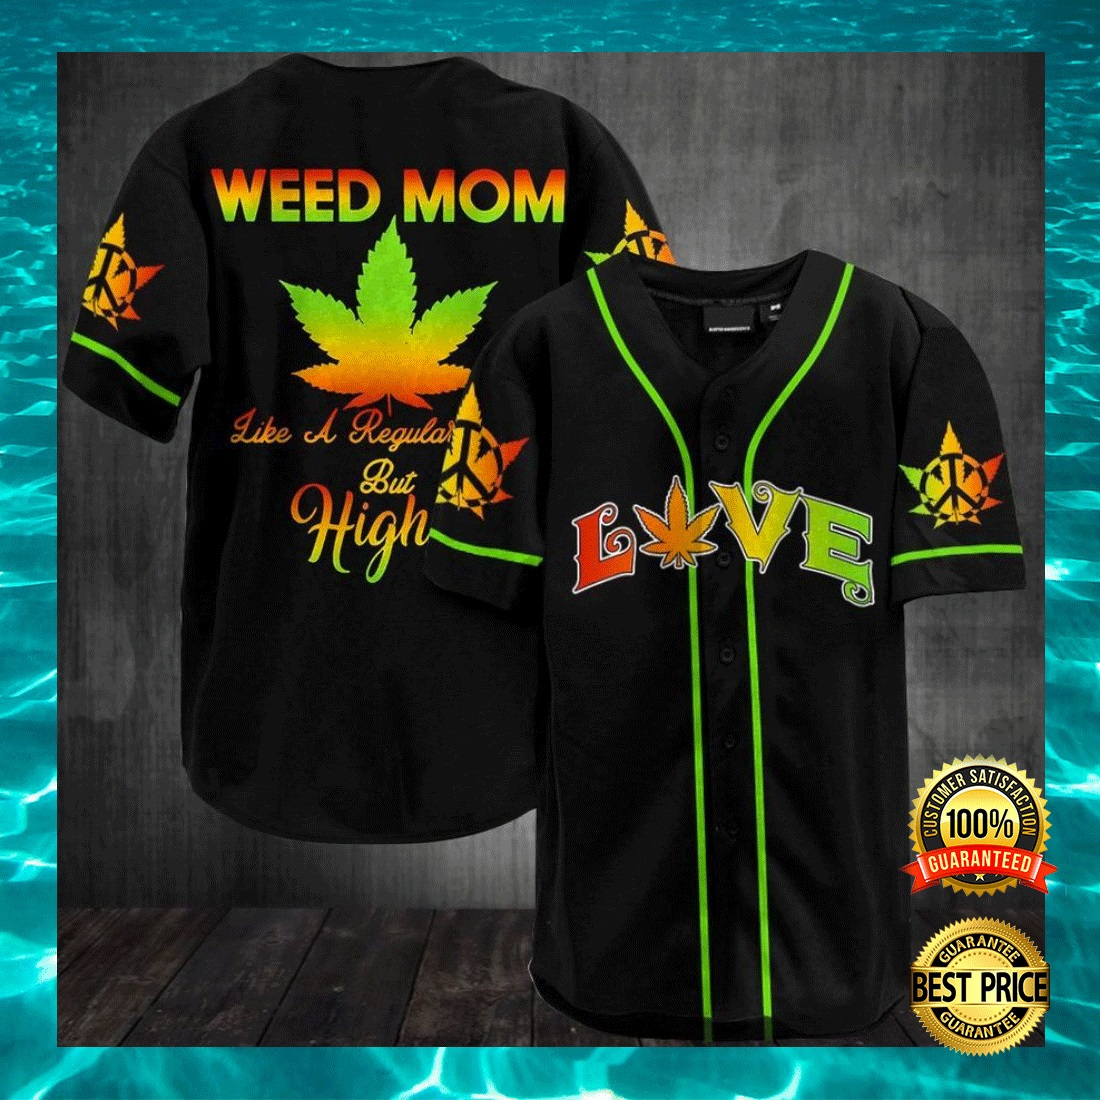 WEED MOM LIKE A REGULAR MOM BUT HIGHER BASEBALL JERSEY 6